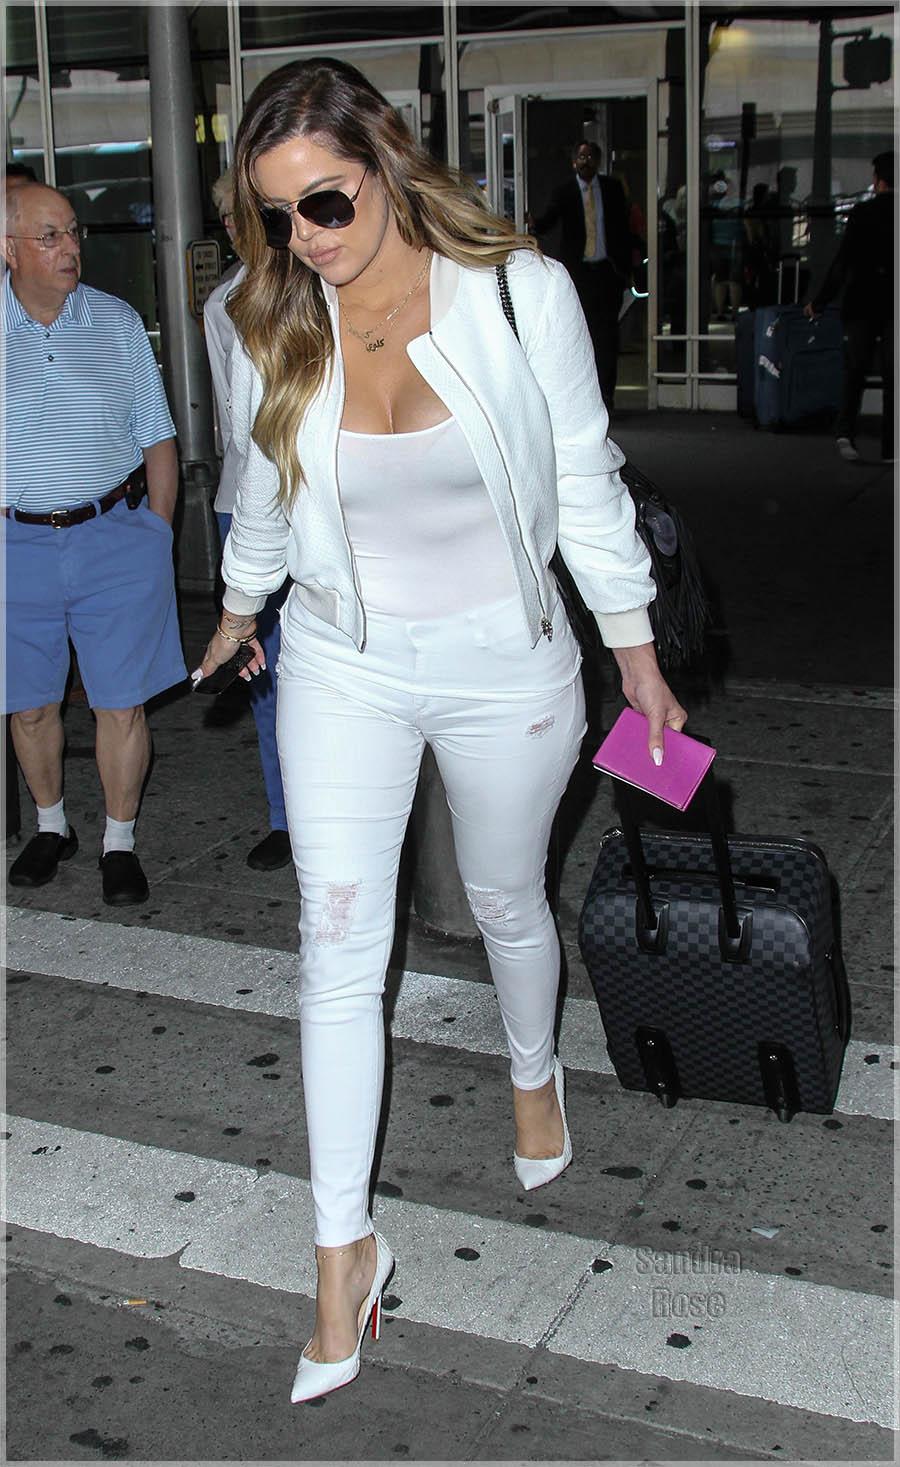 Khloe Kardashian arrives at John F. Kennedy International Airport (JFK) following sister Kim's wedding